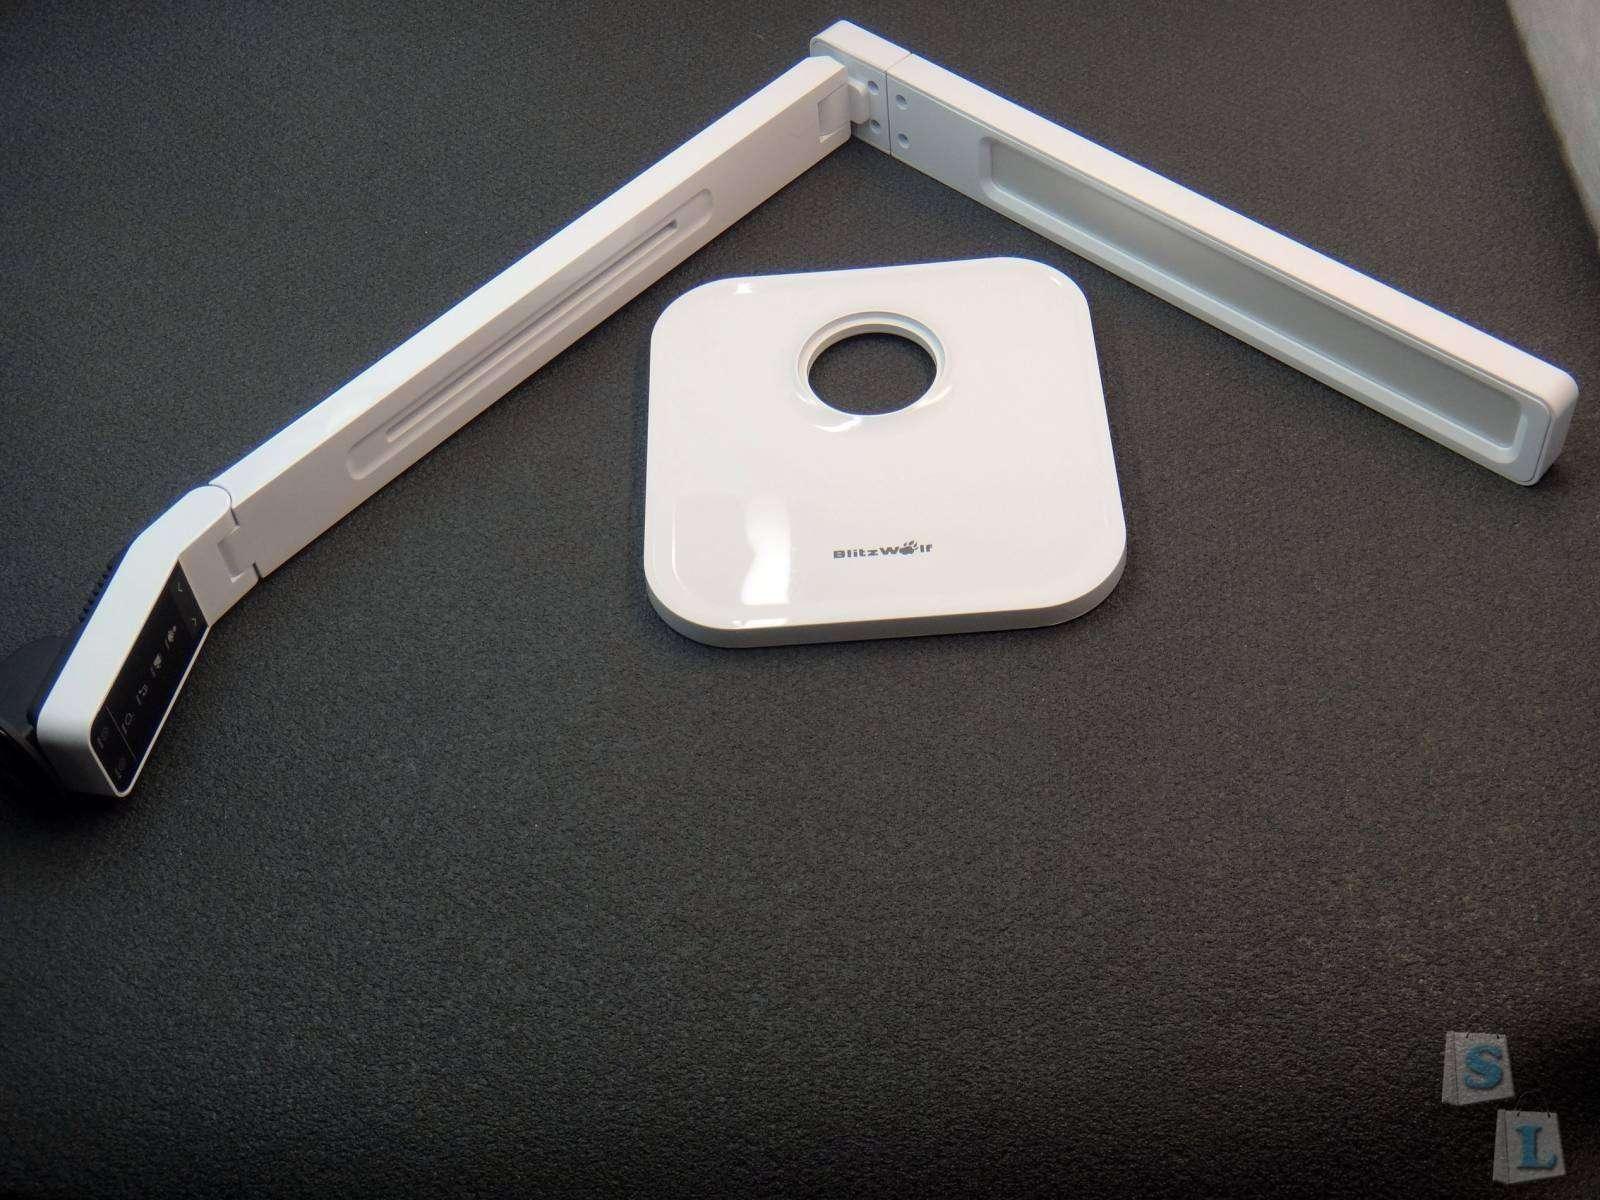 Banggood: Обзор BlitzWolf® BW-LТ1 'умная' LED лампа с хорошим функционалом